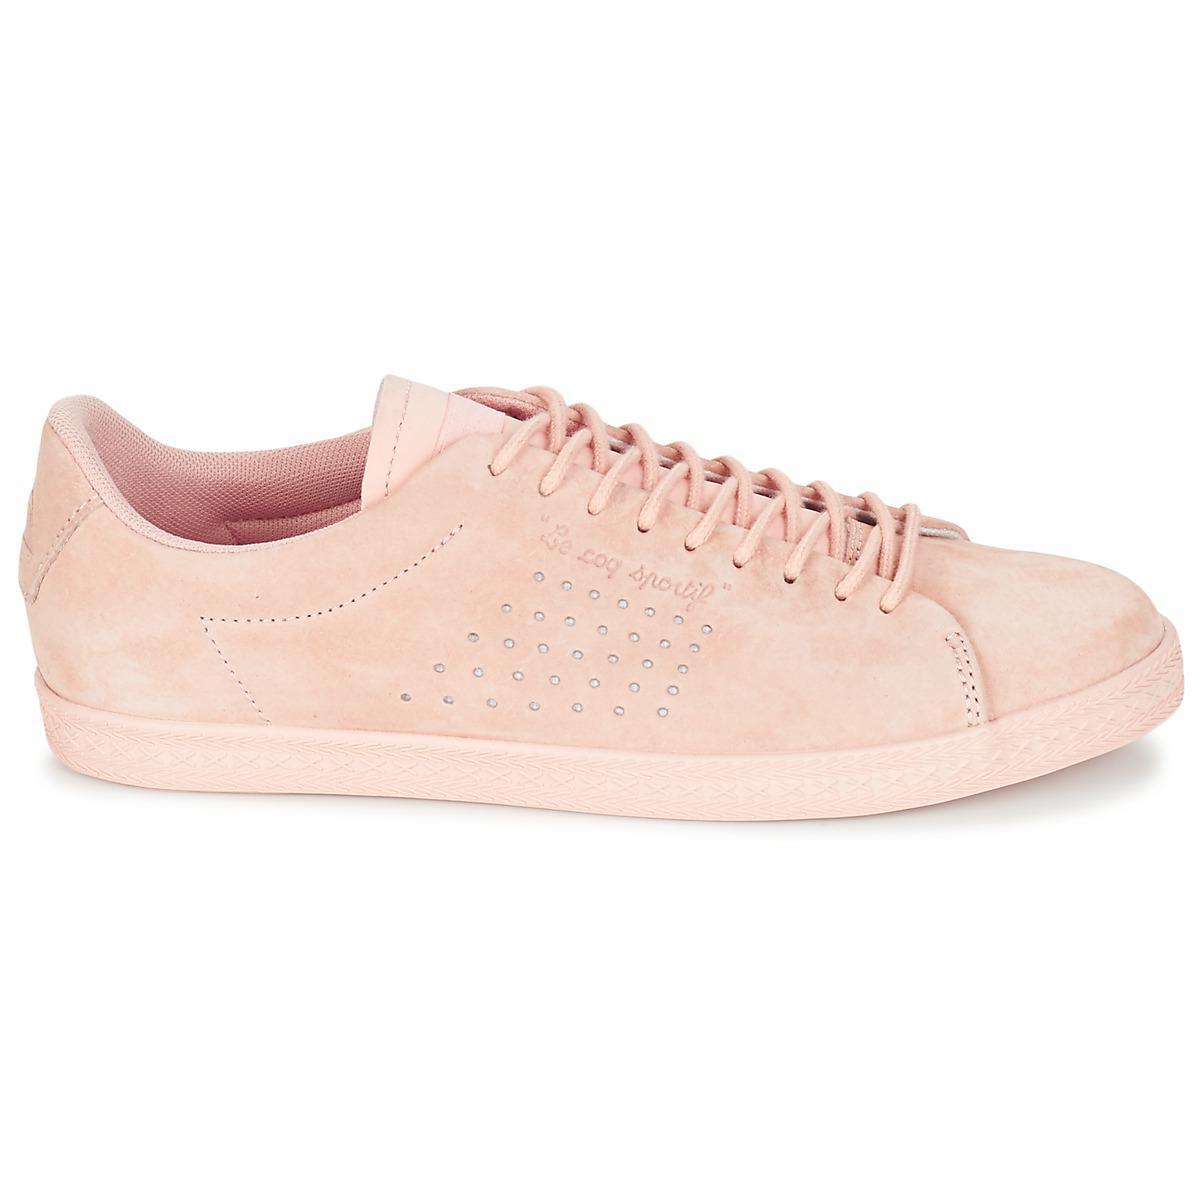 0d9fd4704a1a Le Coq Sportif - Pink Nubuck Charline Sneakers - Lyst. View fullscreen